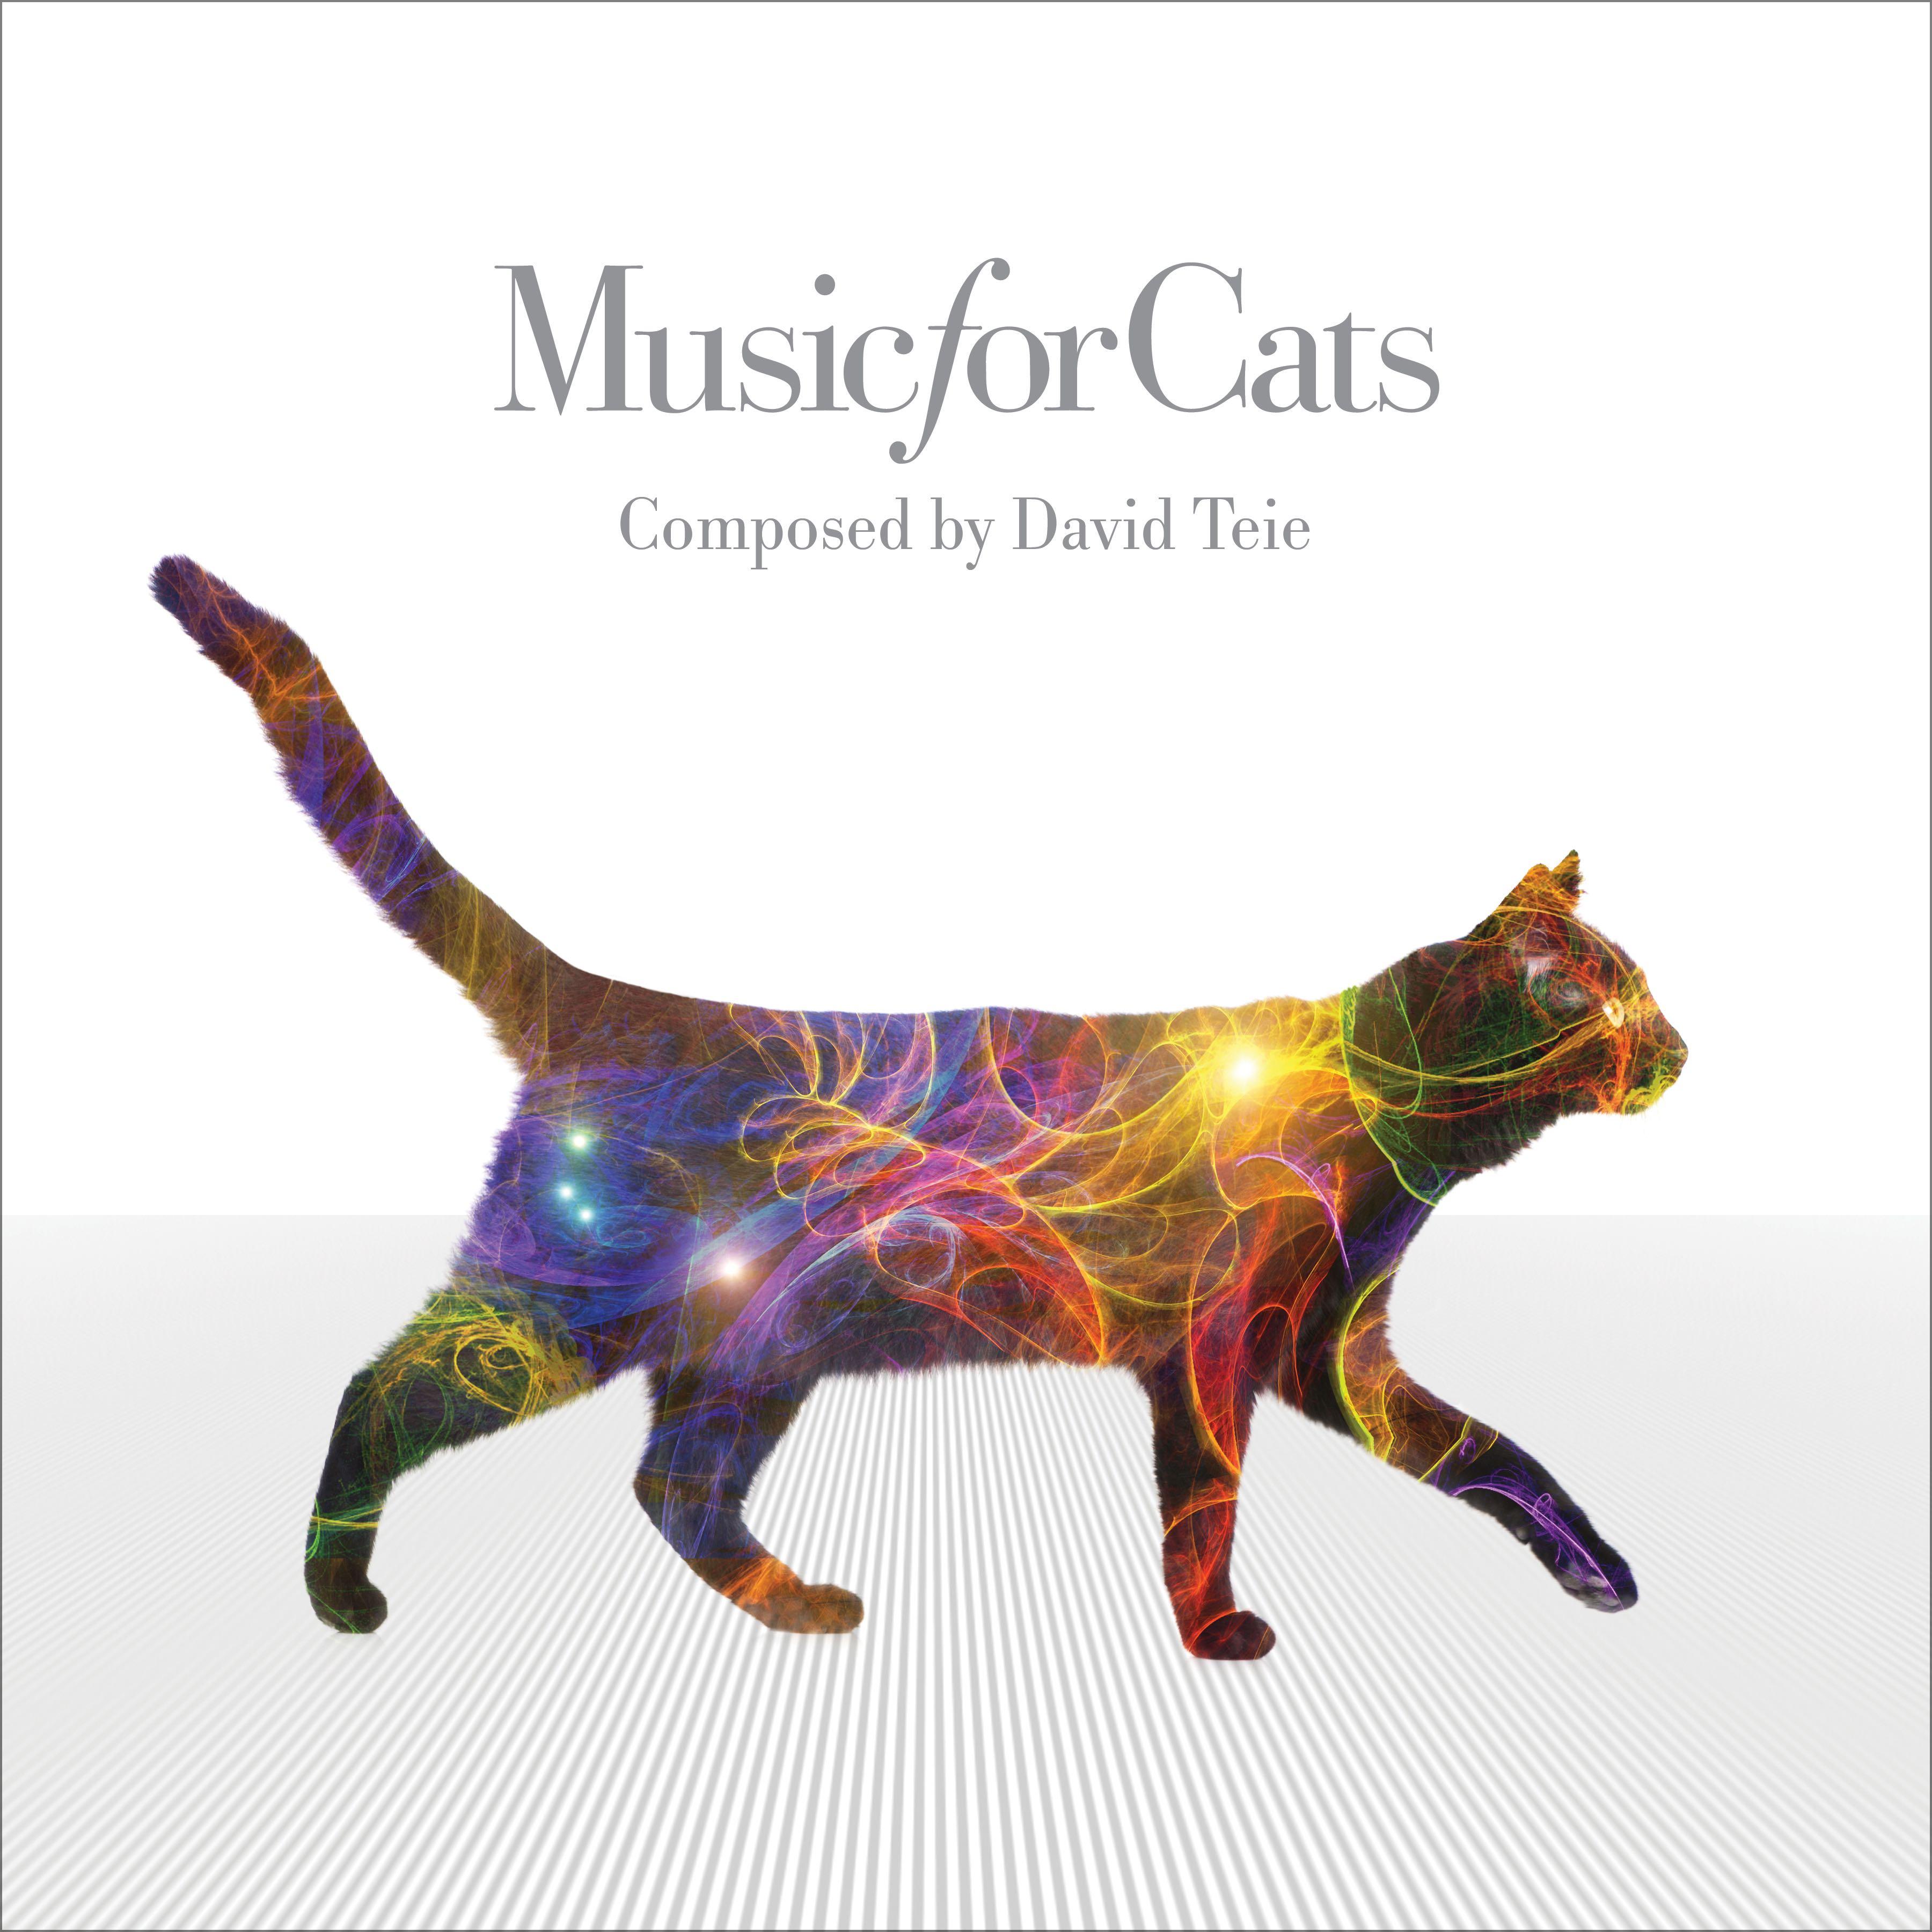 musicforcats-artwork